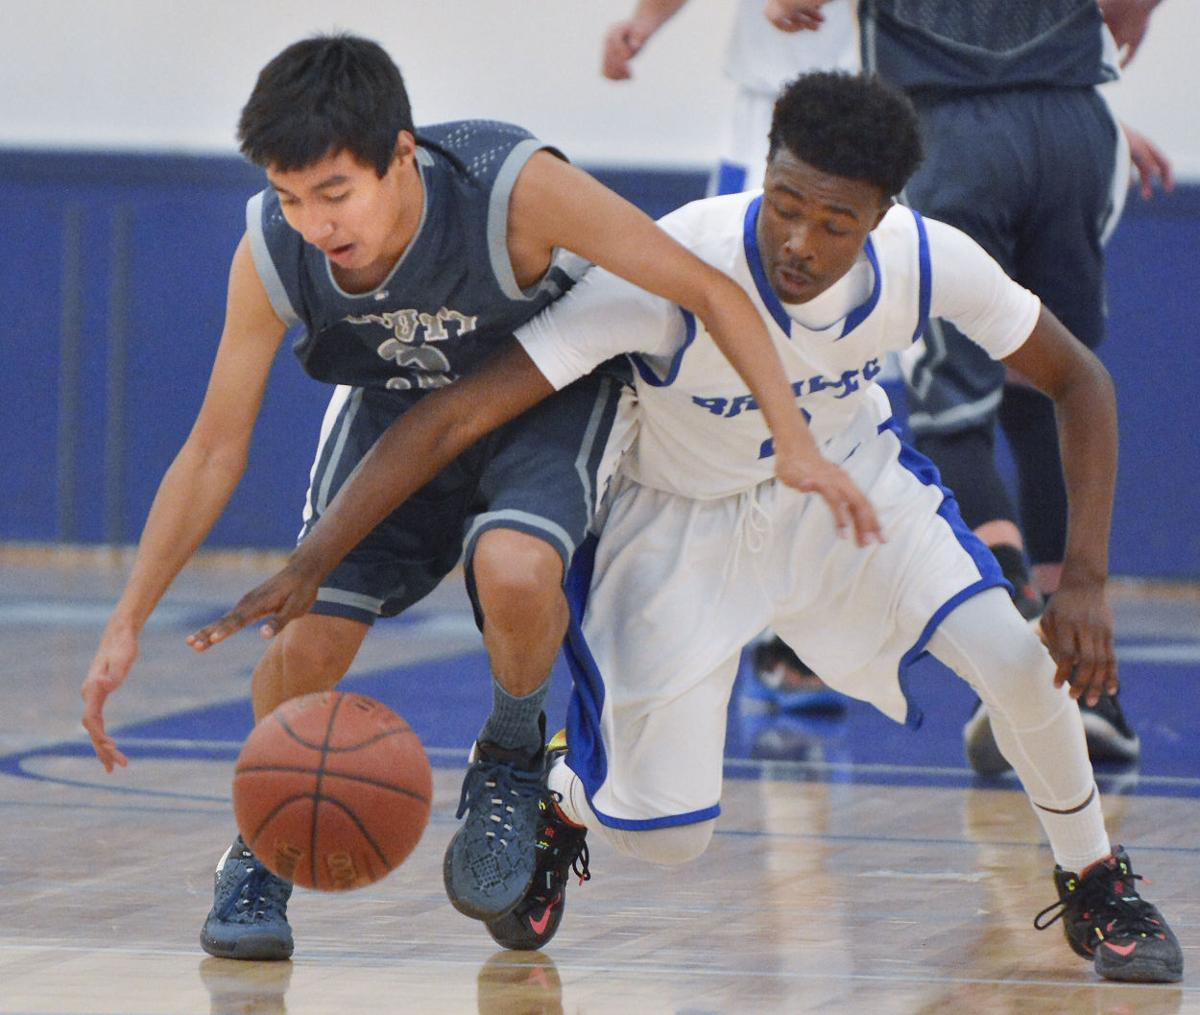 121515 OAHS LHS b basketball 01.jpg